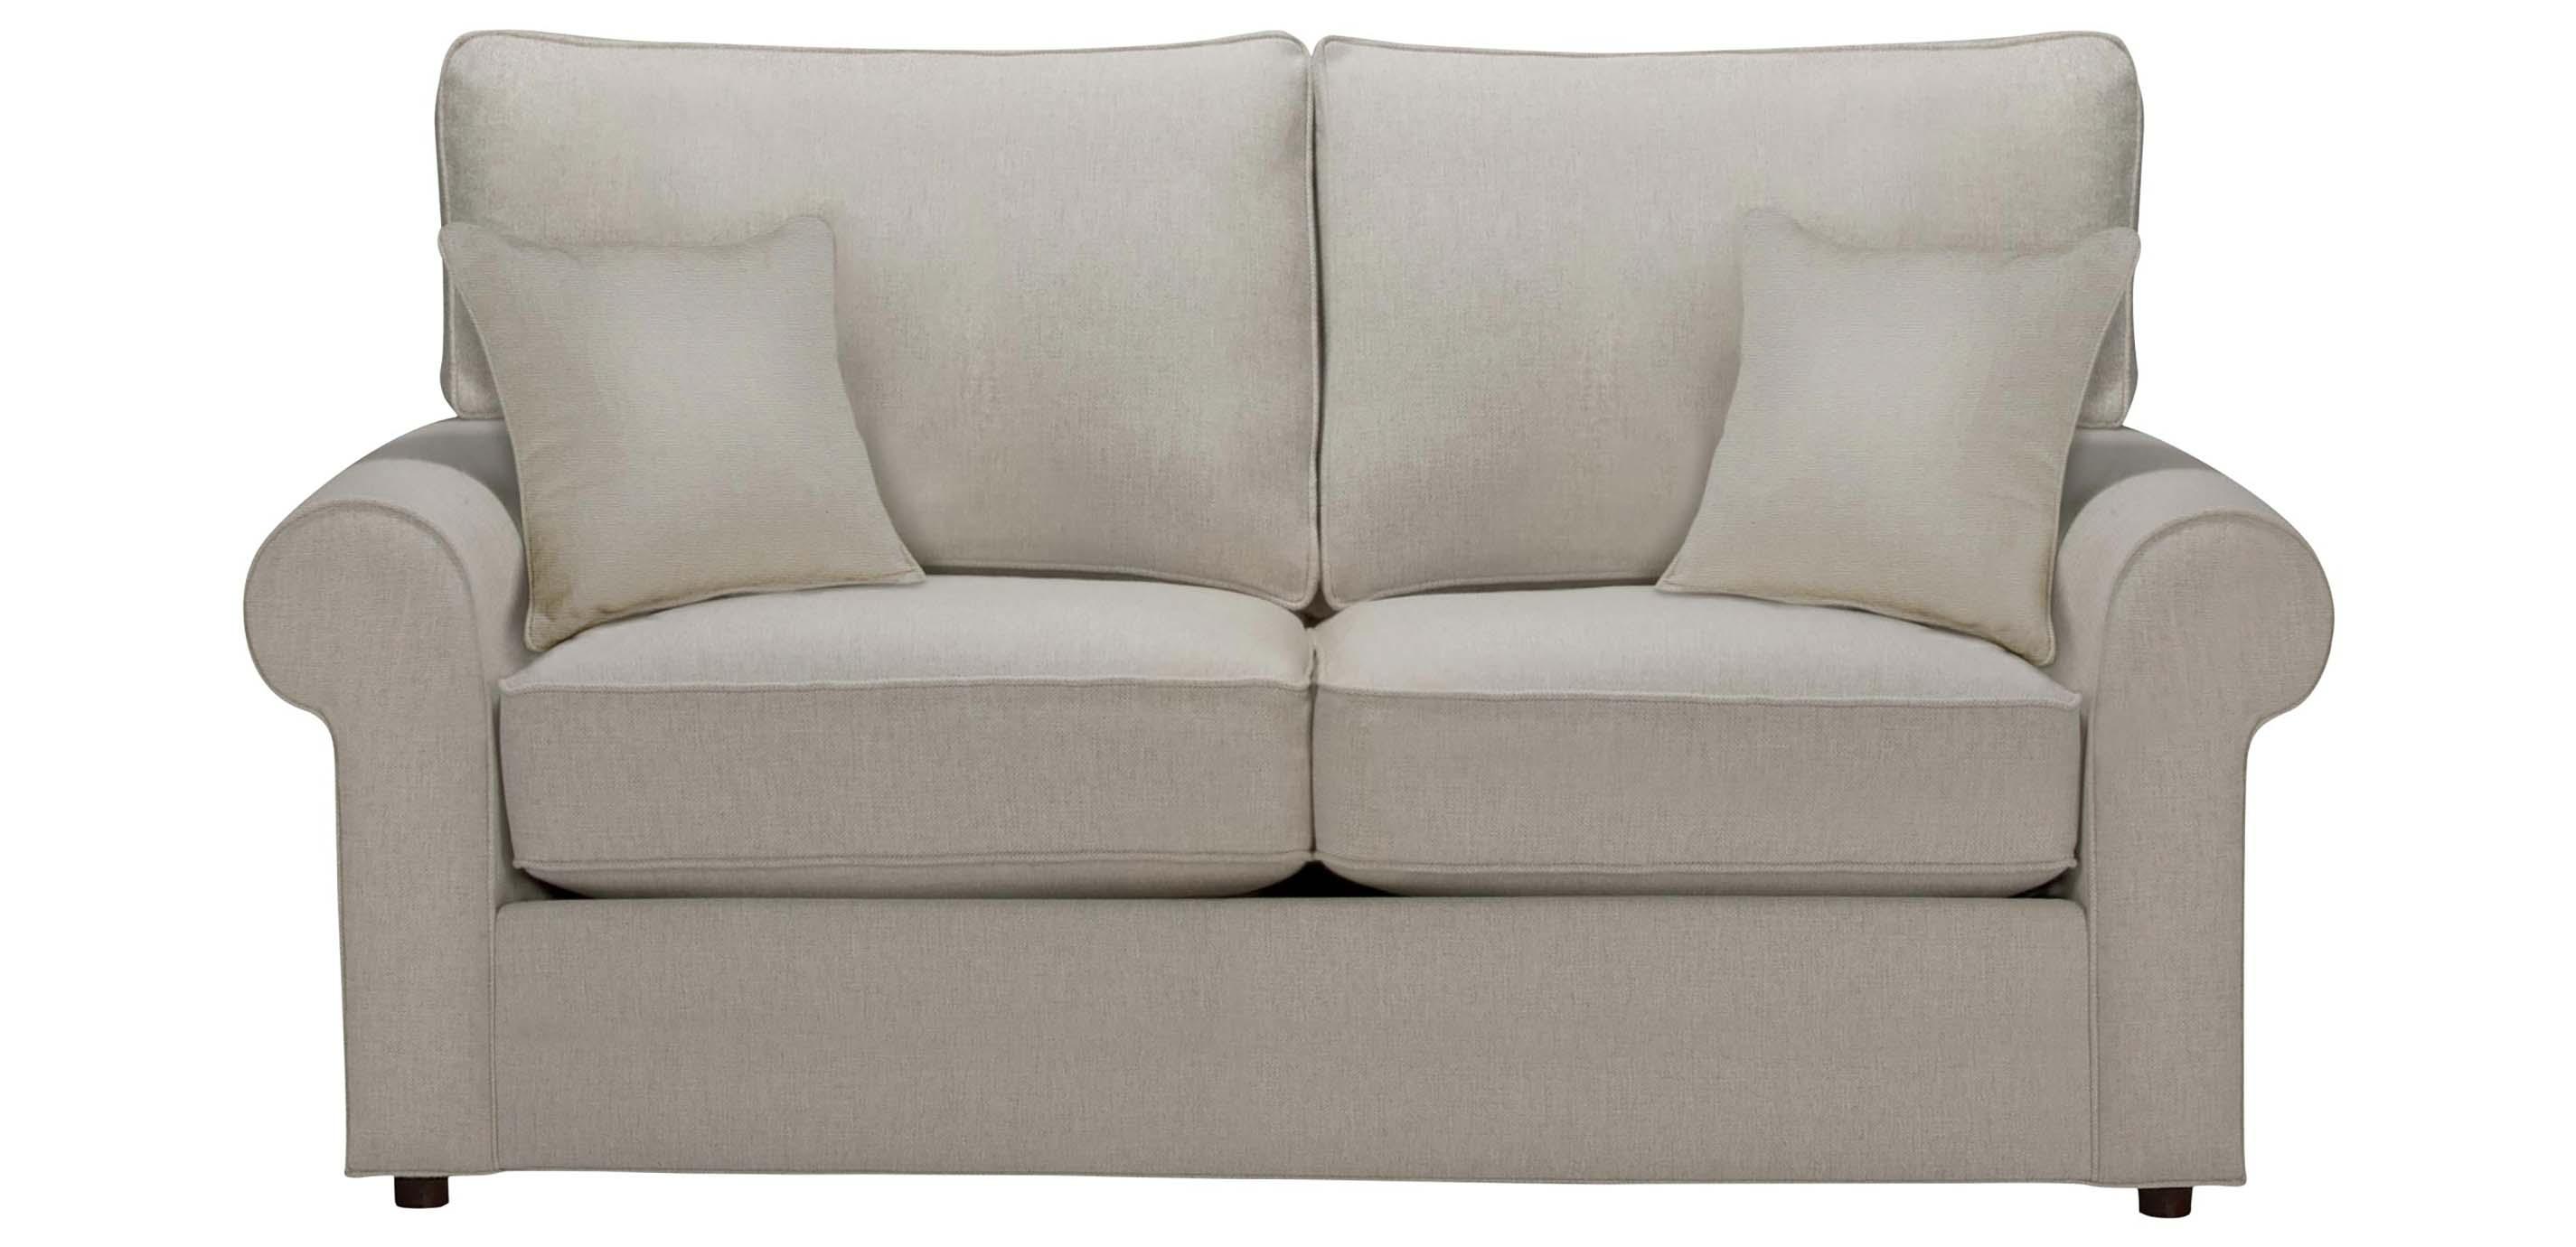 retreat roll arm sofa quick ship sofas loveseats ethan allen. Black Bedroom Furniture Sets. Home Design Ideas